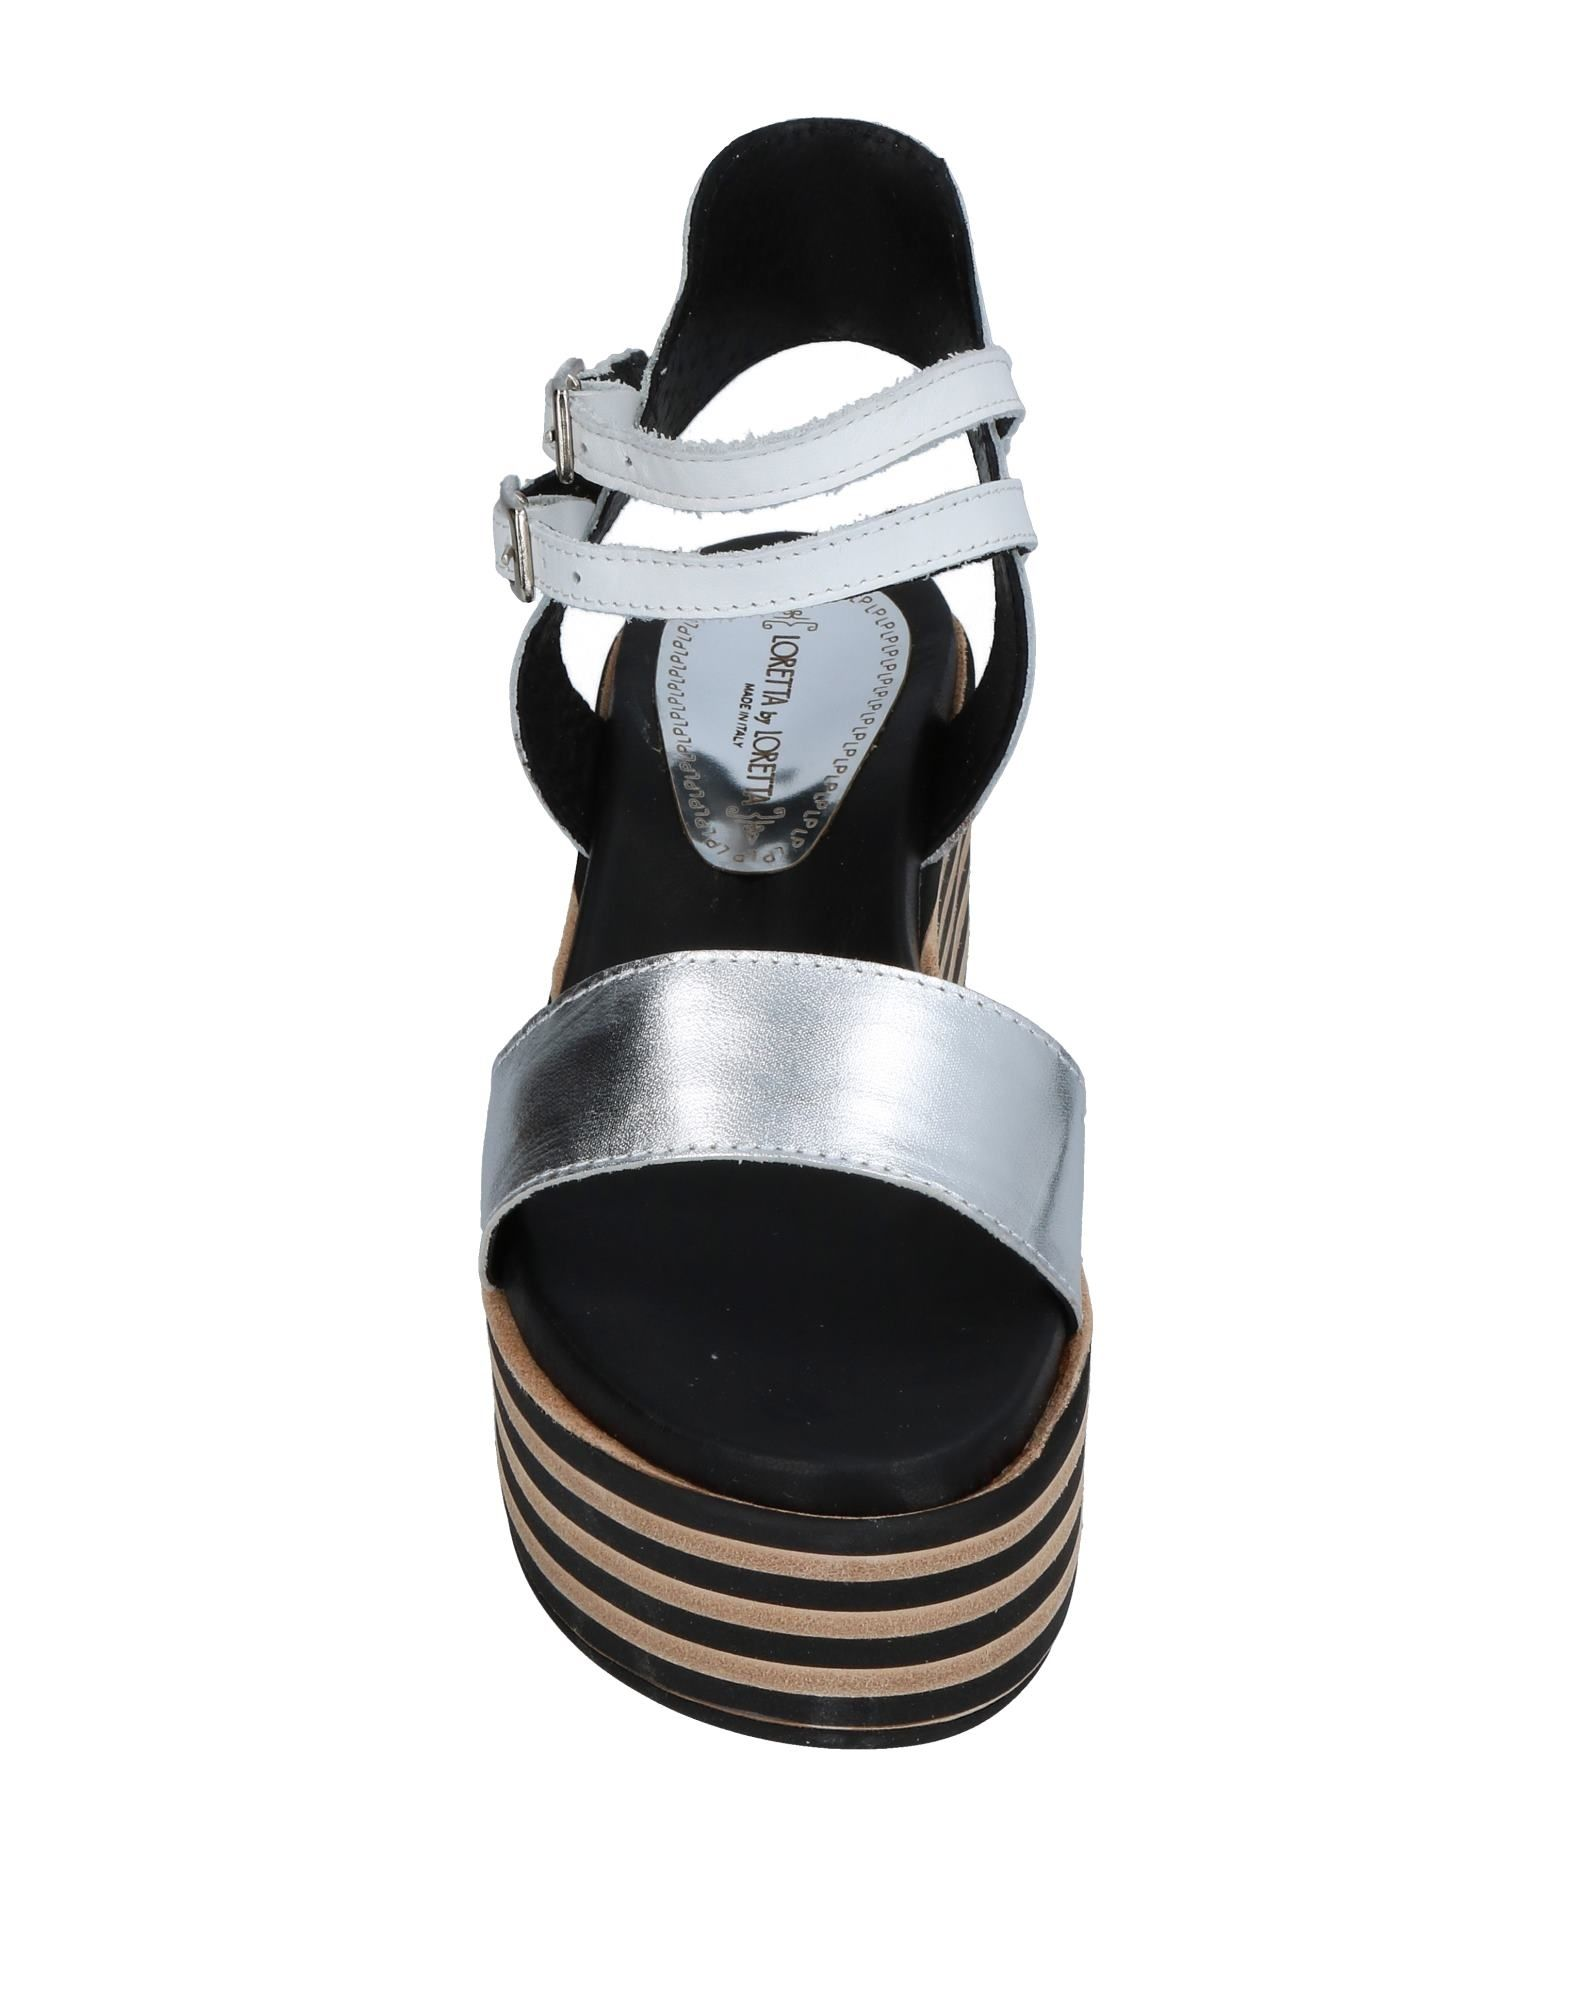 Loretta By Schuhe Loretta Sandalen Damen  11374193CH Gute Qualität beliebte Schuhe By 3eac22